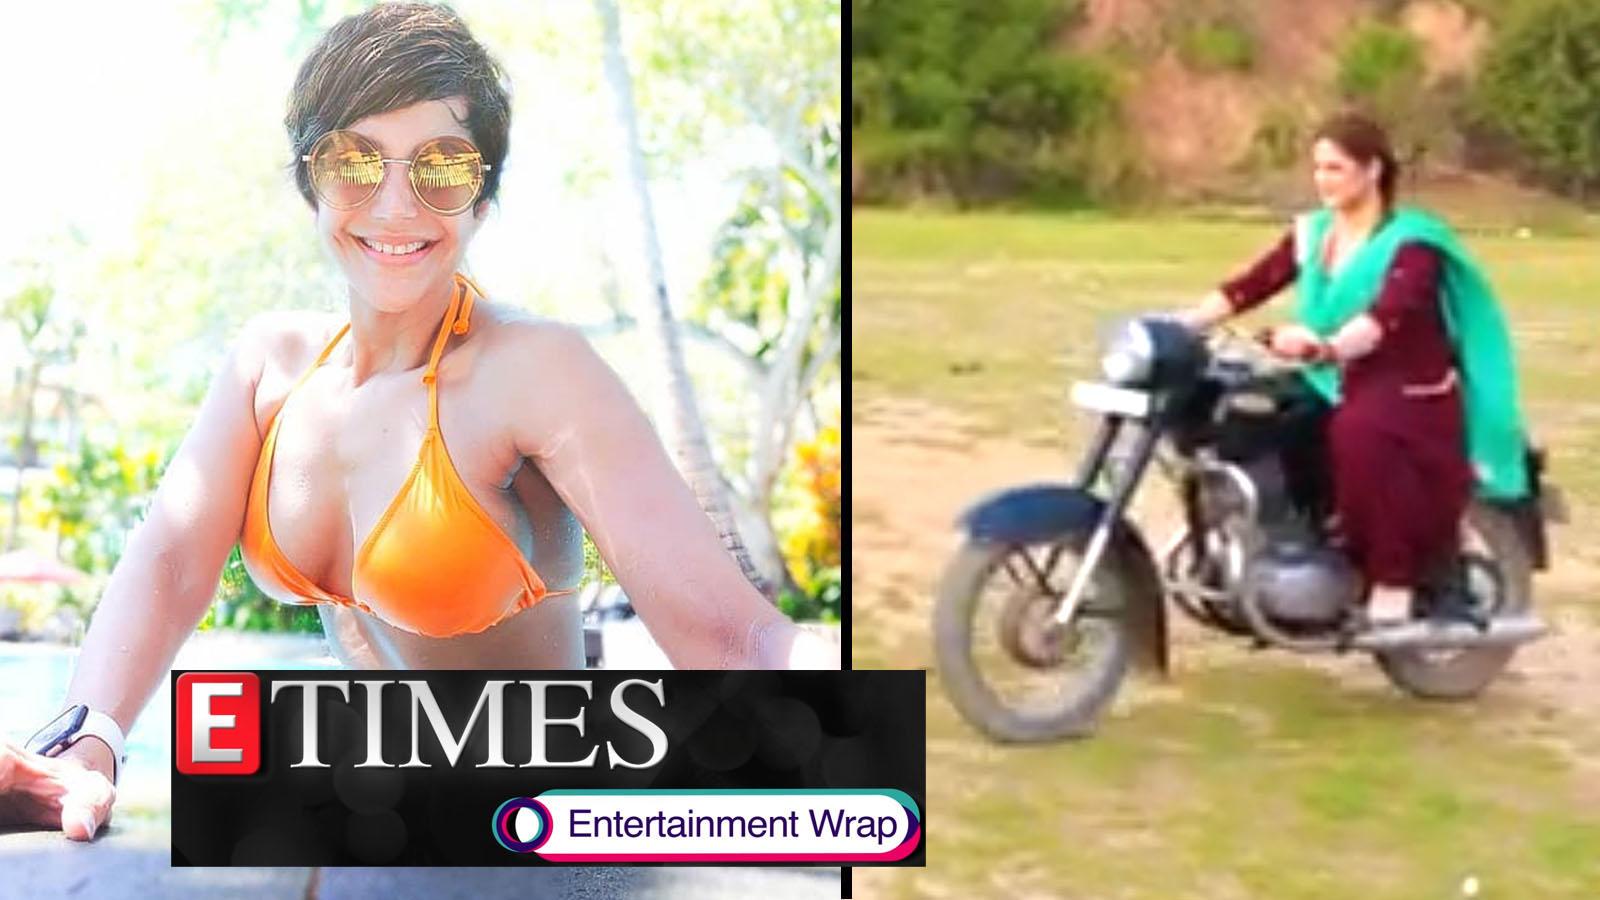 mandira-bedi-flaunts-incredibly-toned-figure-in-orange-bikini-zareen-khan-rides-motorcycle-like-a-pro-and-more